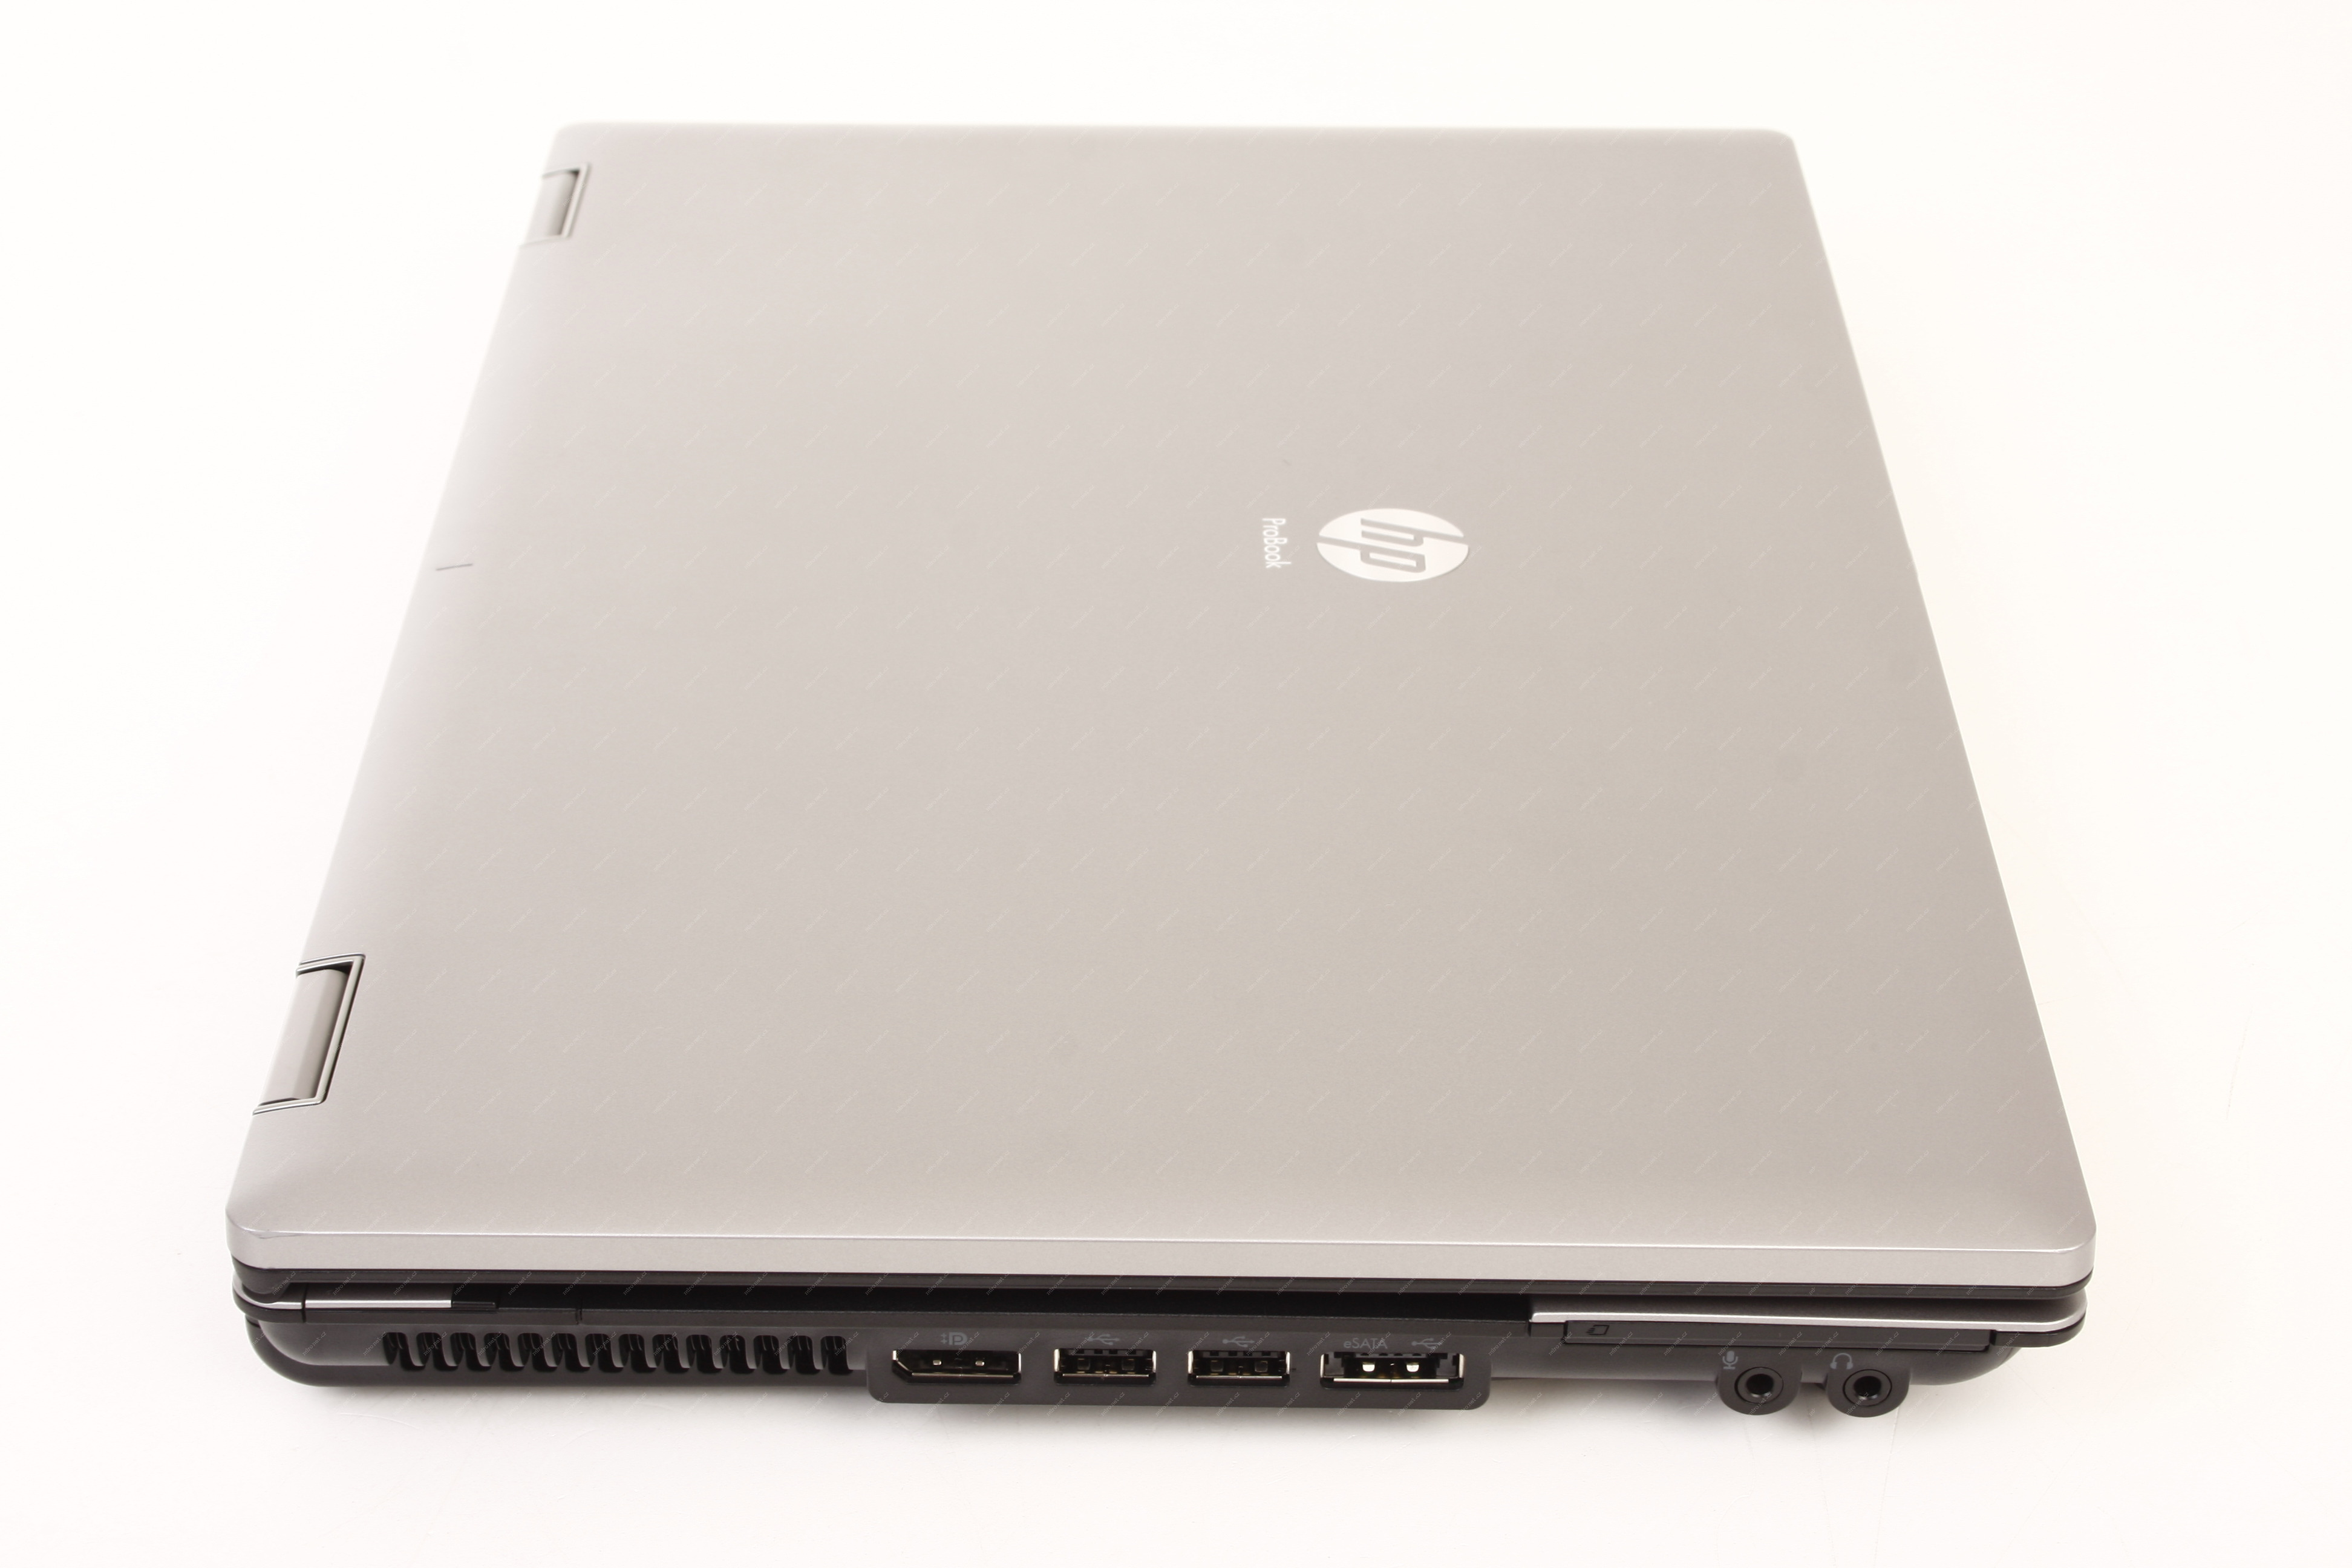 hp probook 6550b audio drivers windows 10